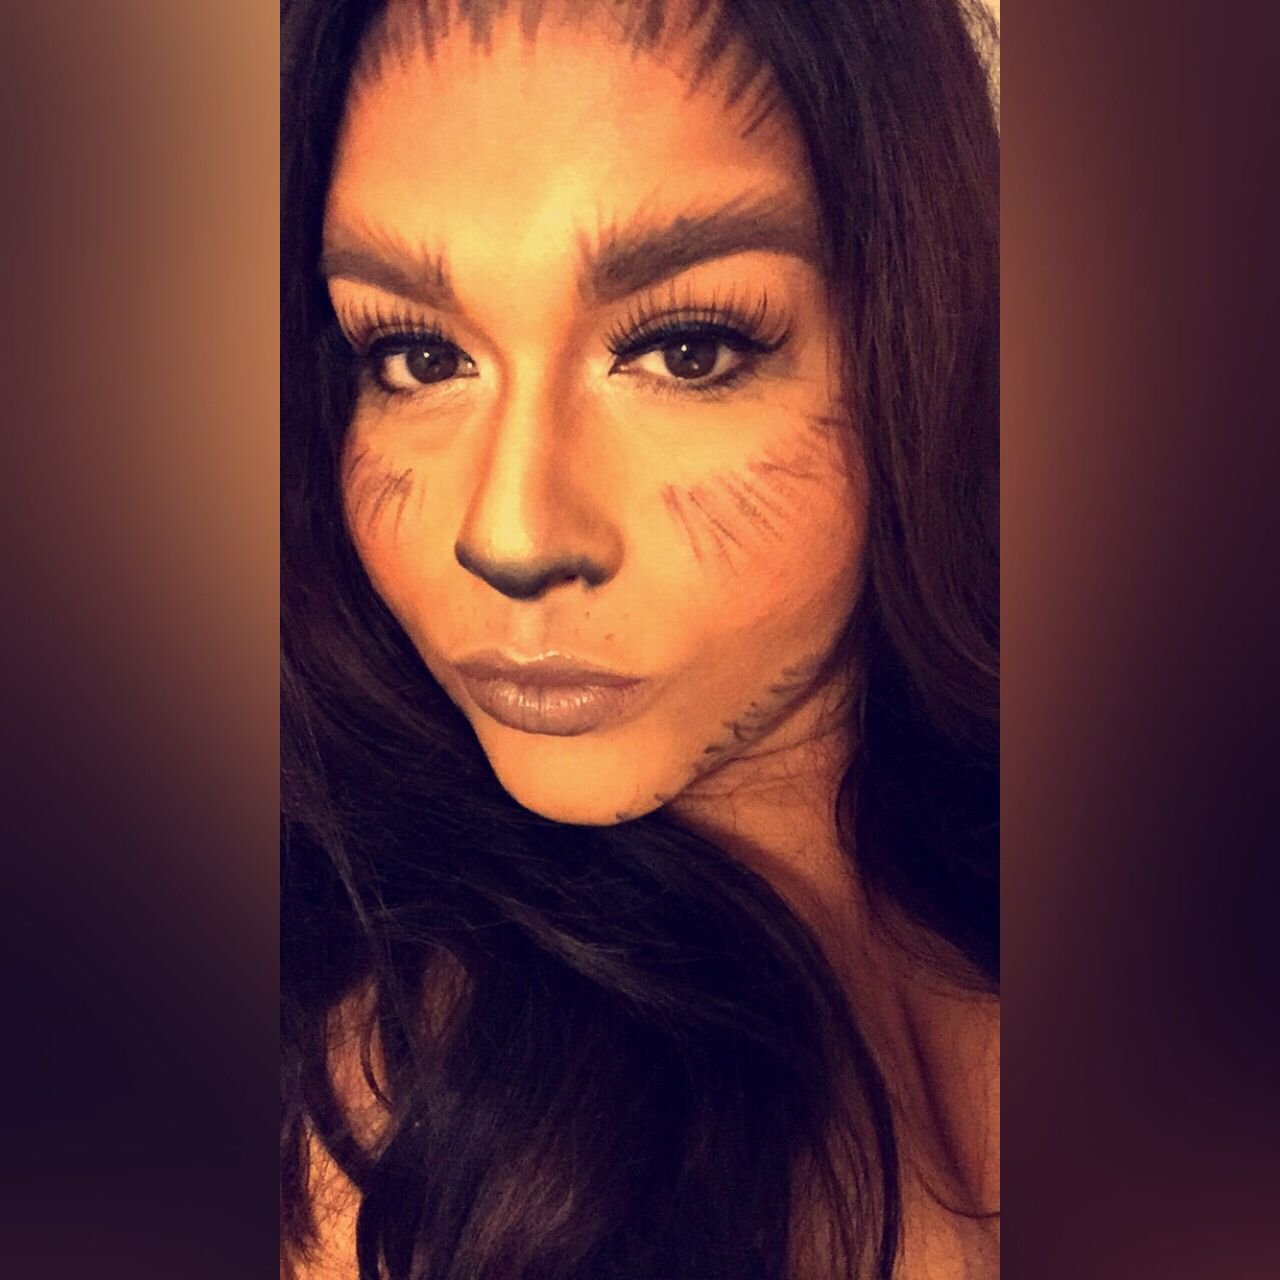 Big Bad Wolf makeup inspiration simple n I'm sure you have